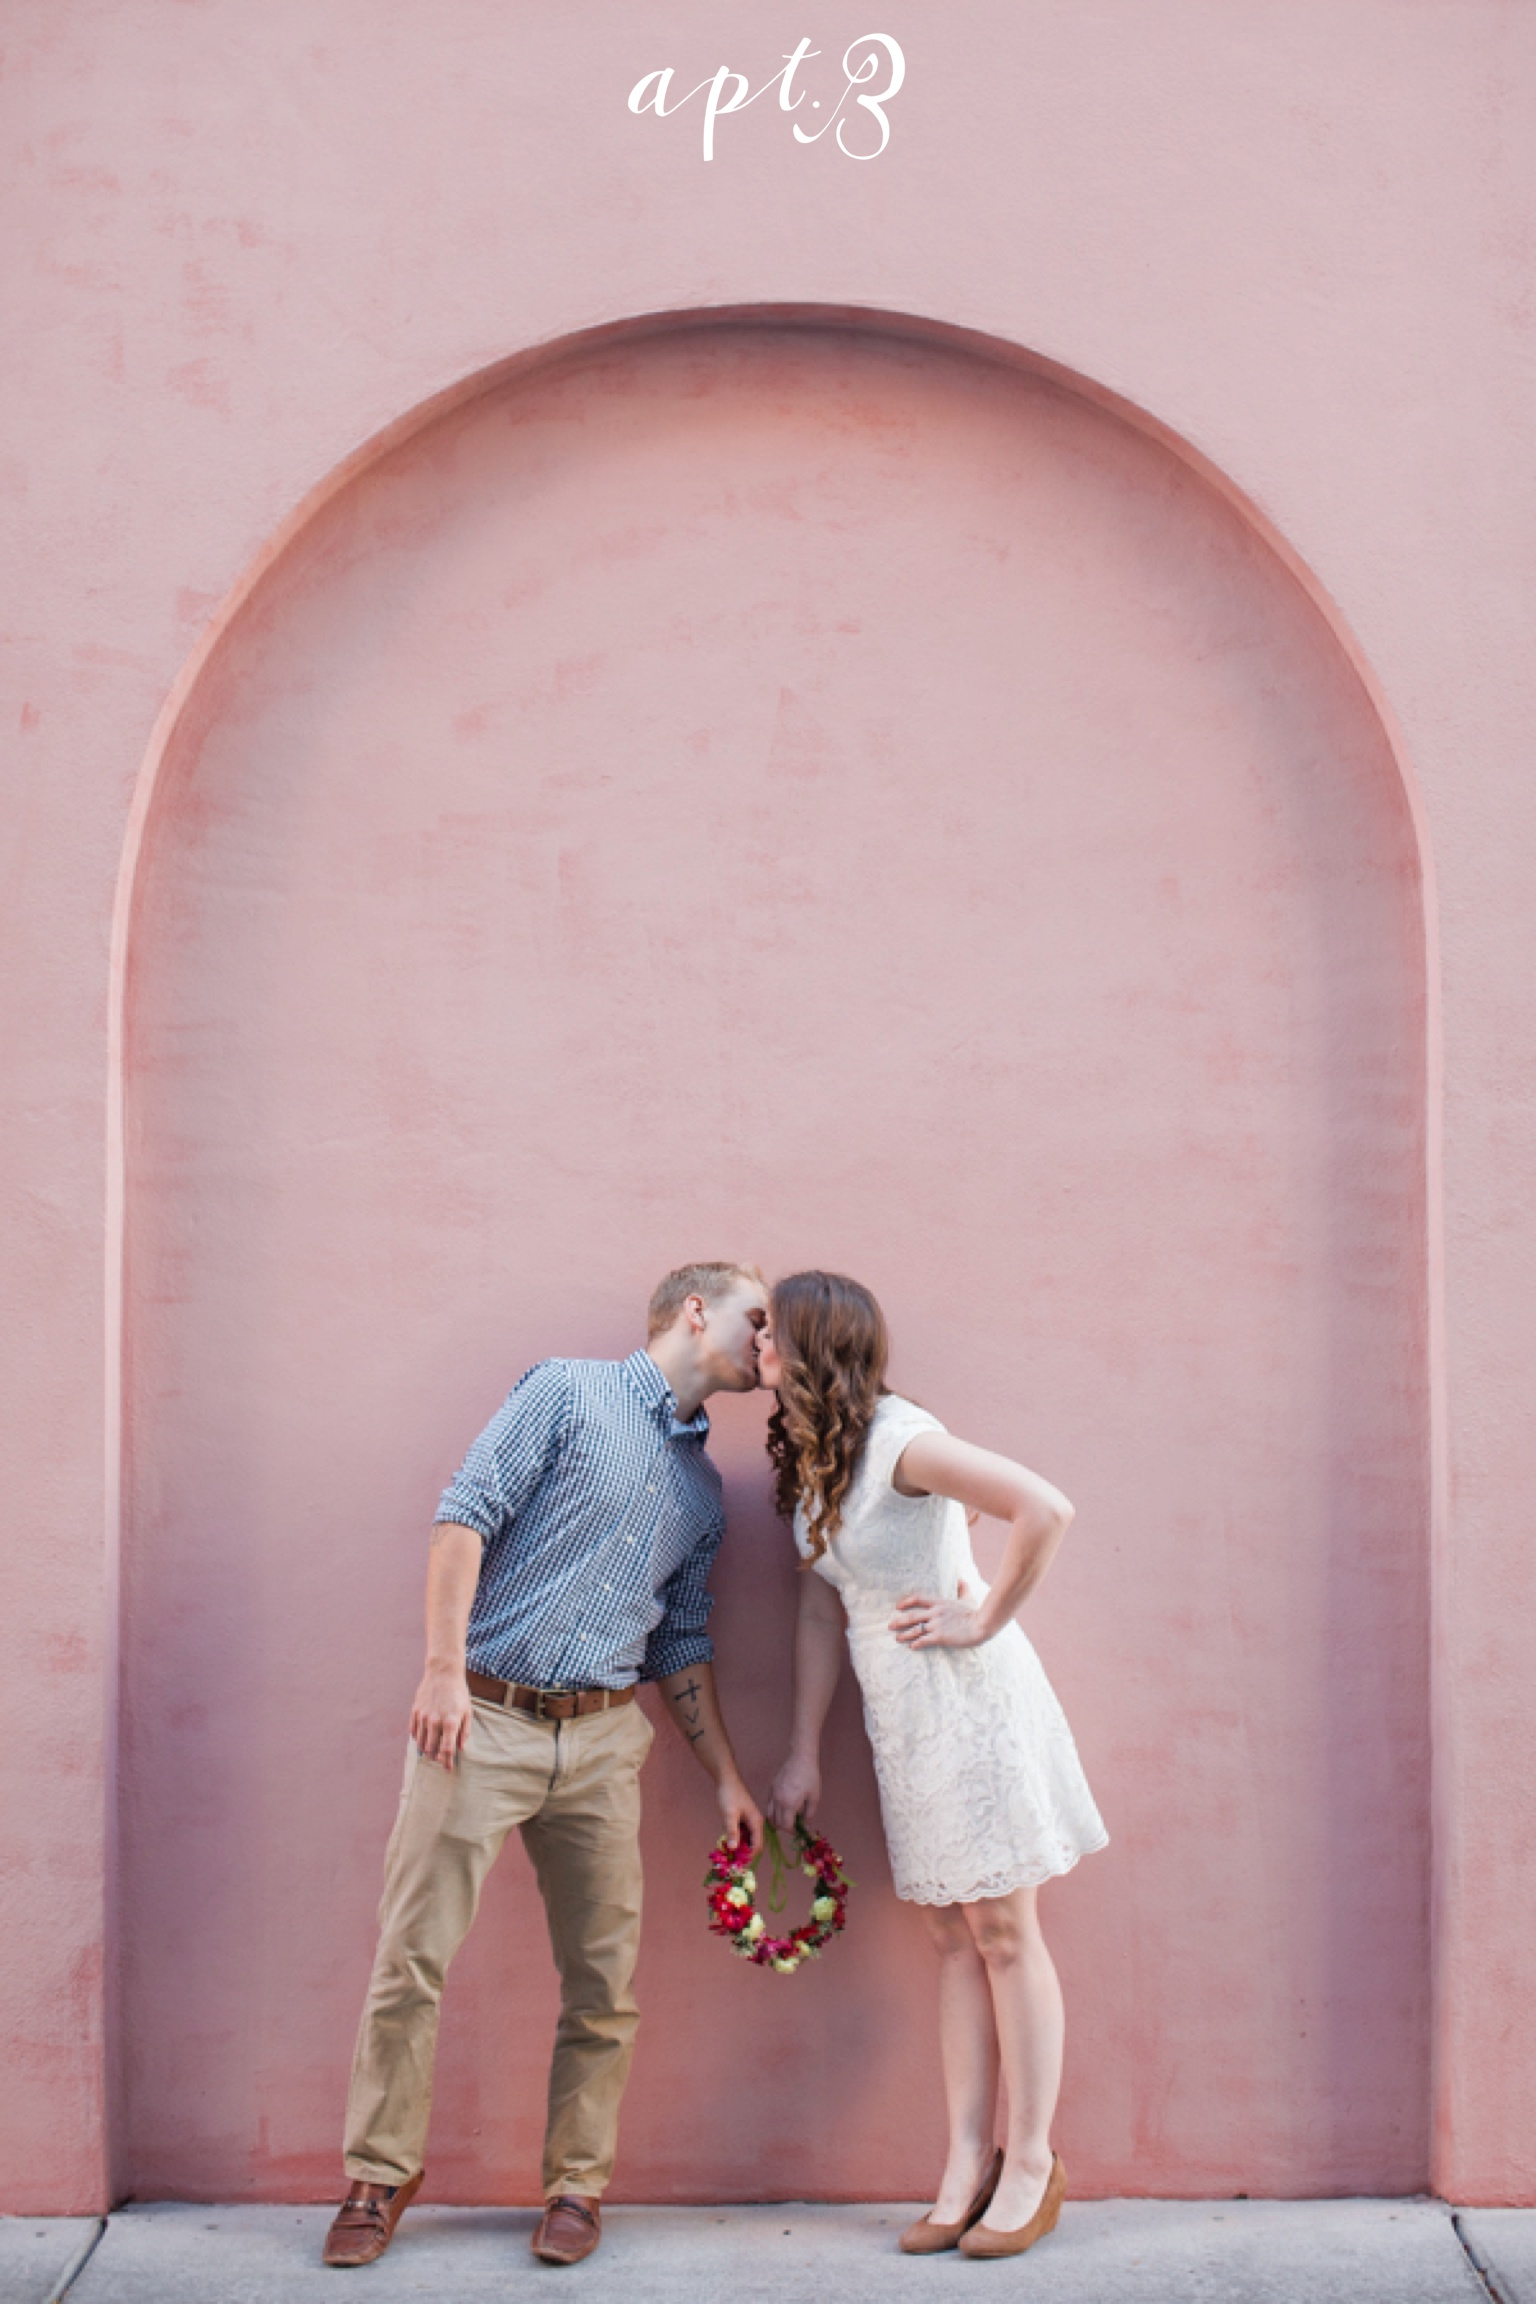 AptBPhotography_SavannahGA_Engagement-70.jpg